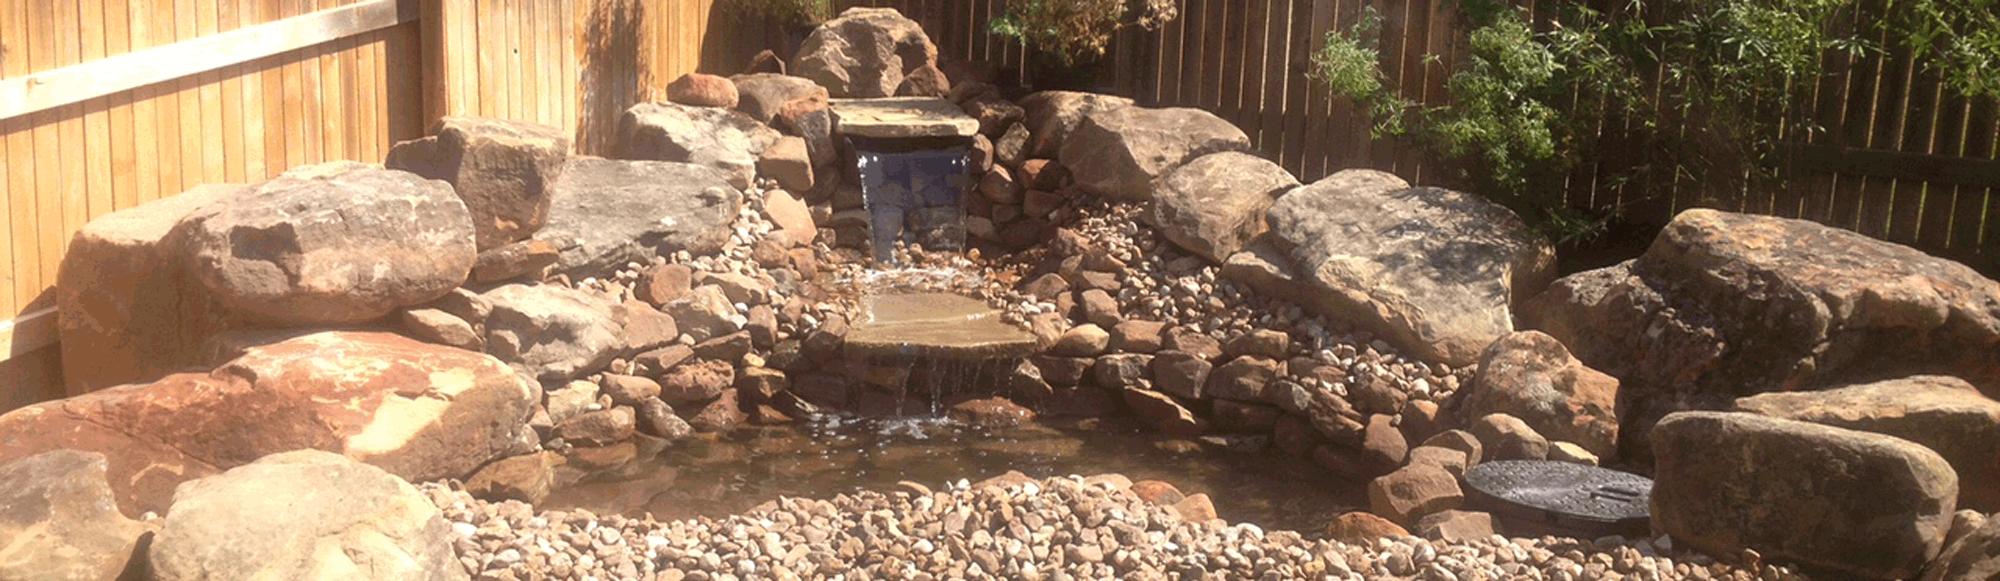 Cedar Park, TX Residential Waterfall Image